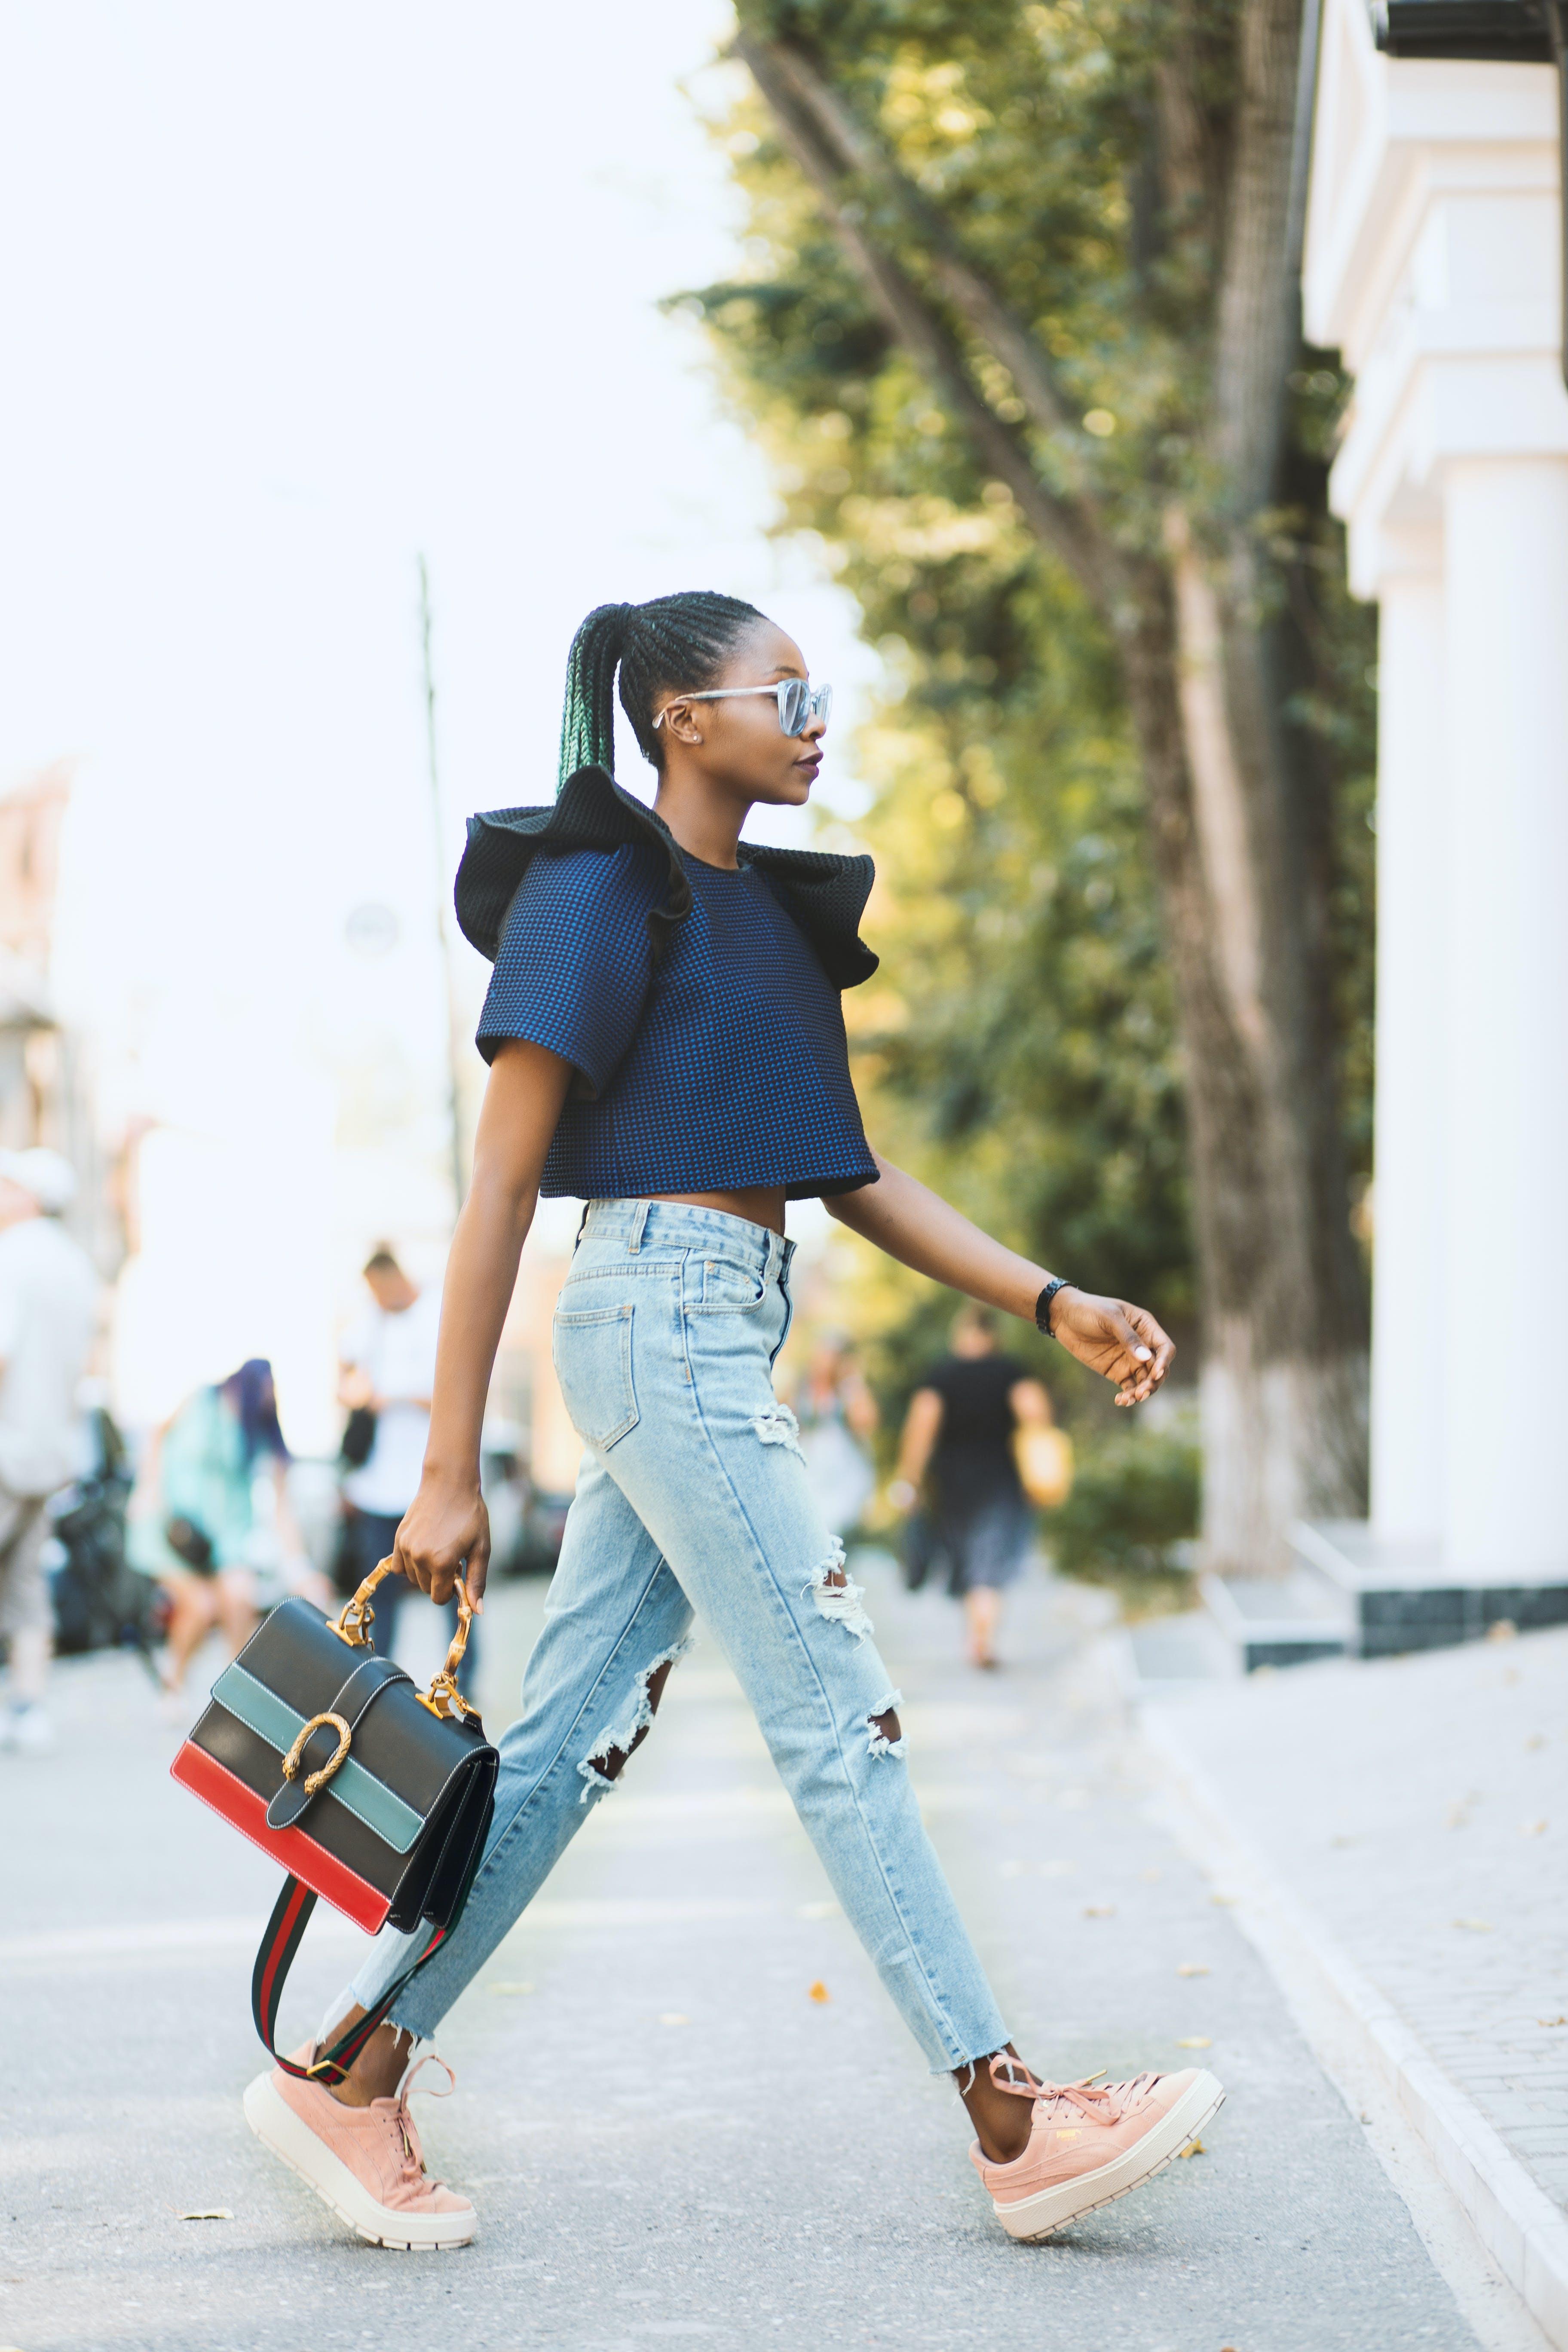 Woman in Blue Crop-top and Distressed Blue Denim Jeans Holding Black Handbag Walking on Road